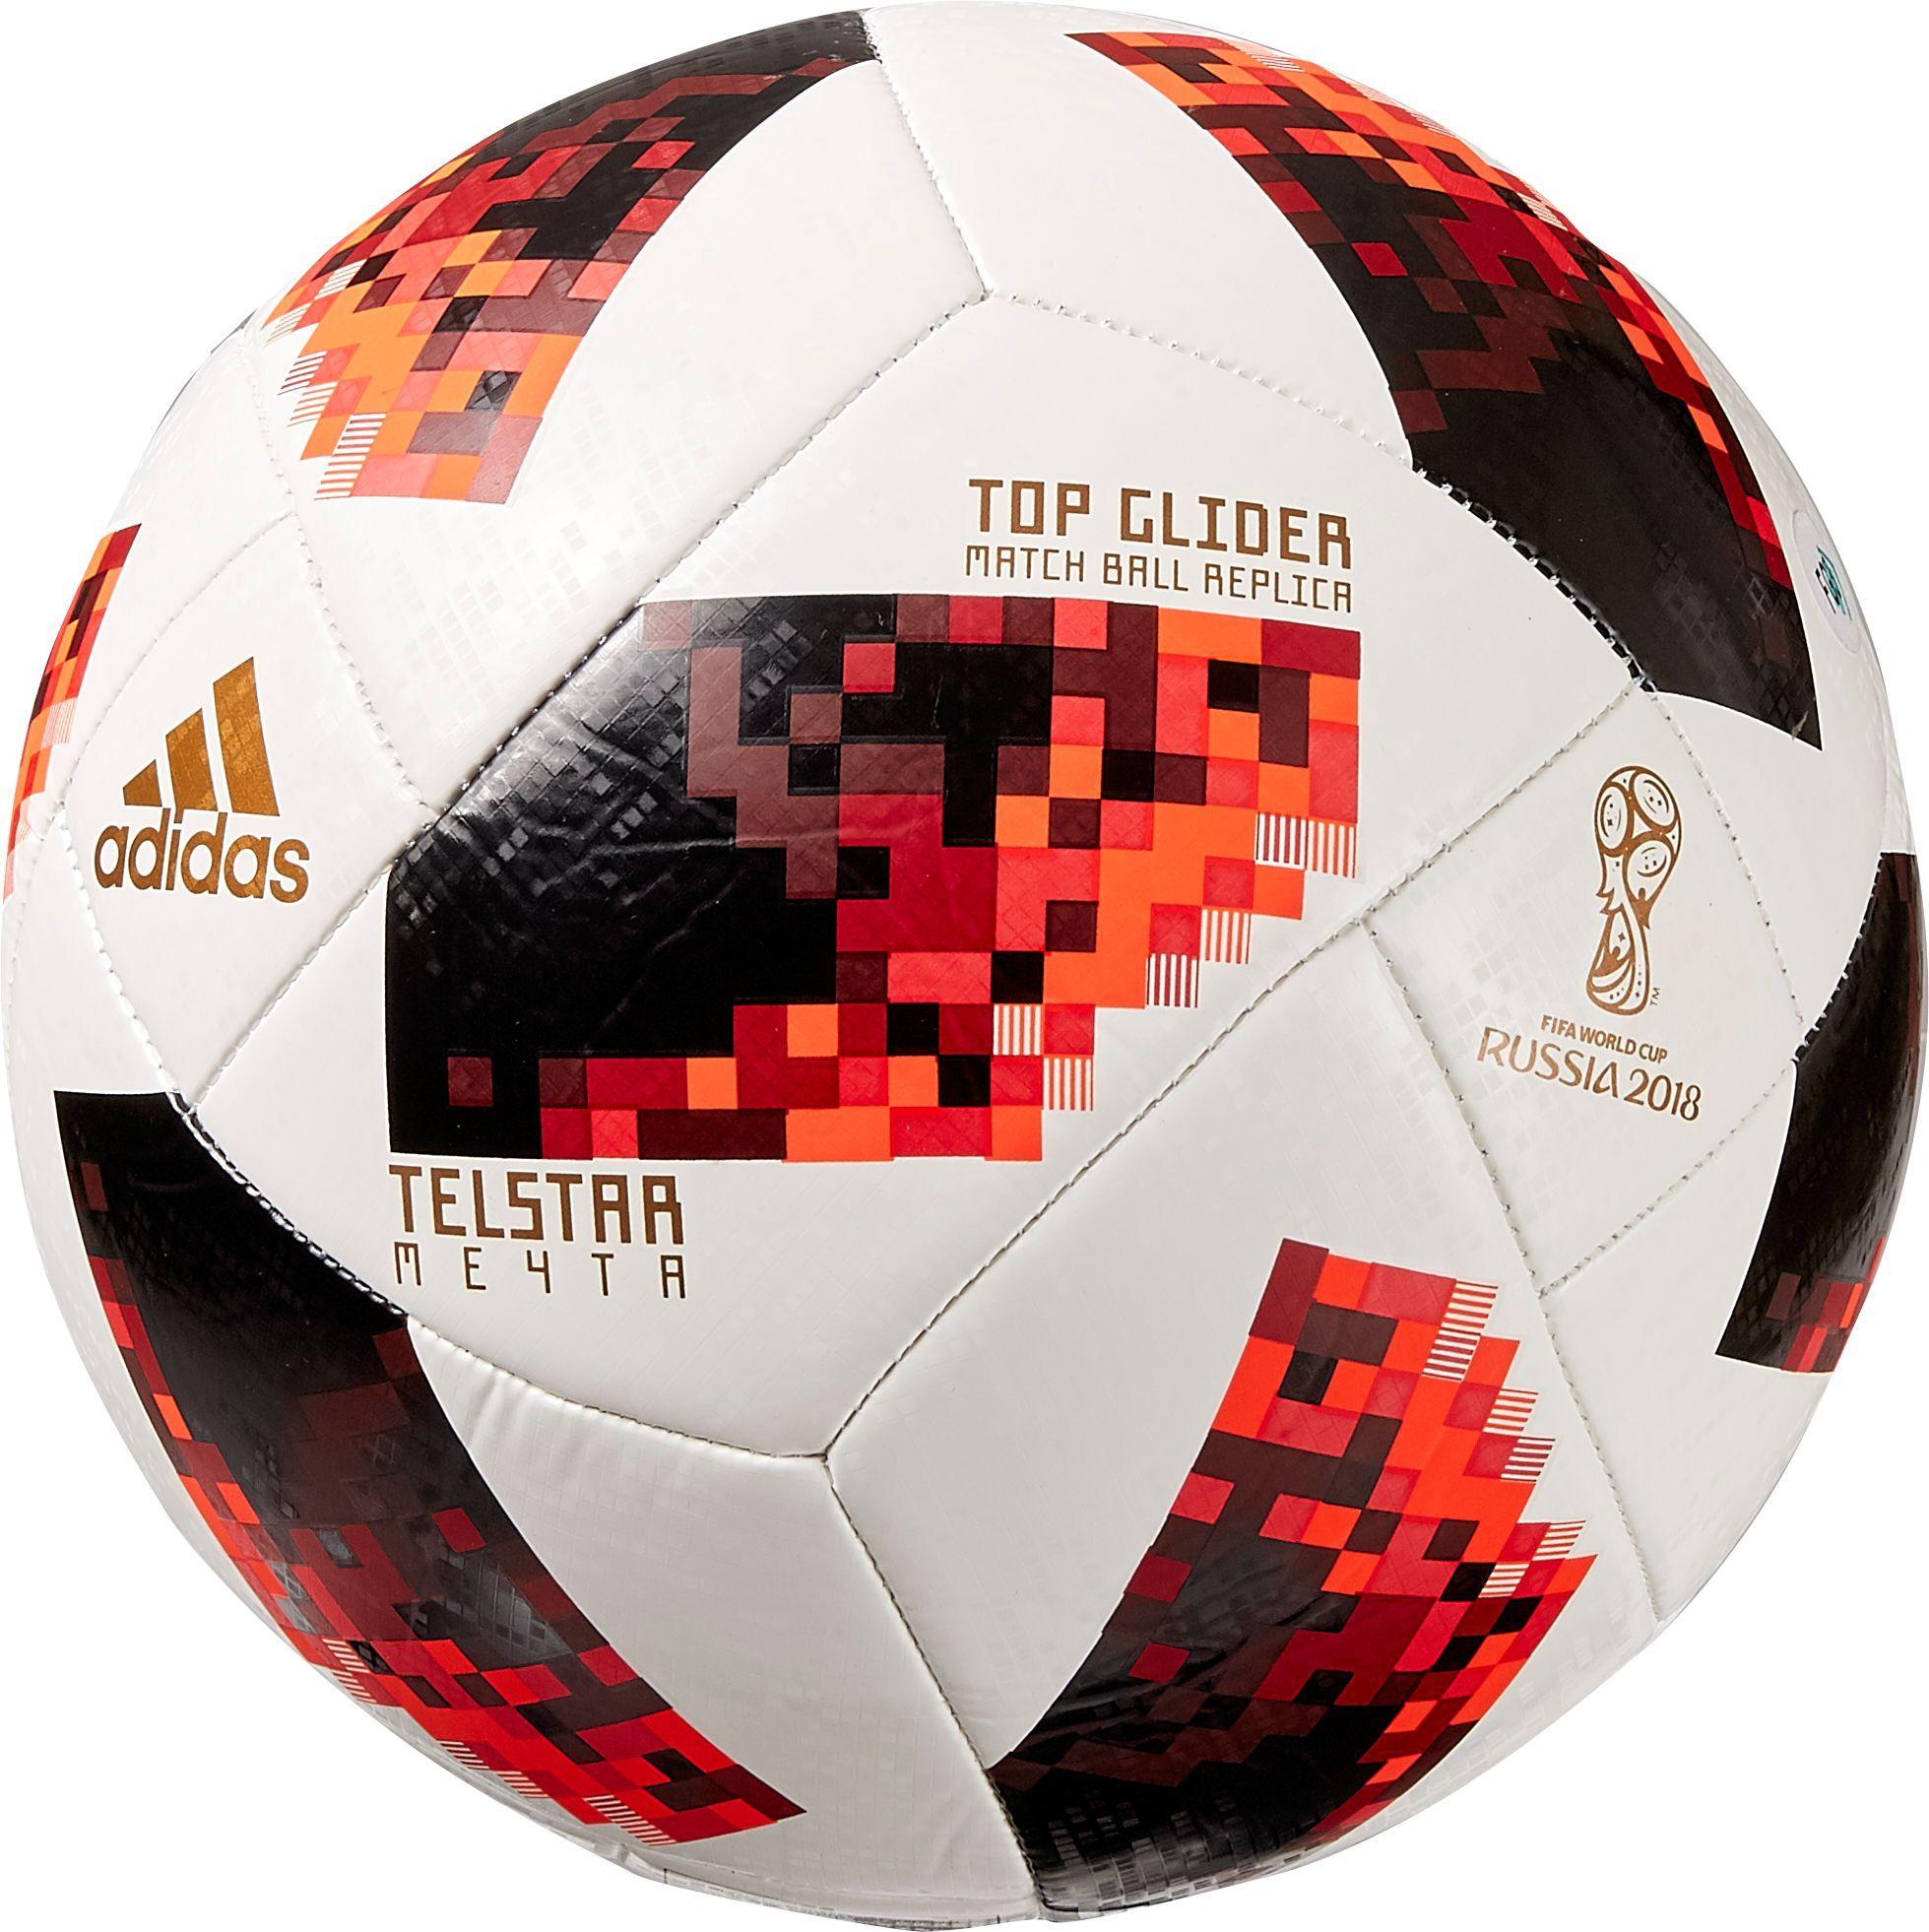 30a224172ff adidas 2018 Fifa World Cup Telstar Mechta Knockout Stage Top Glider Soccer  Ball